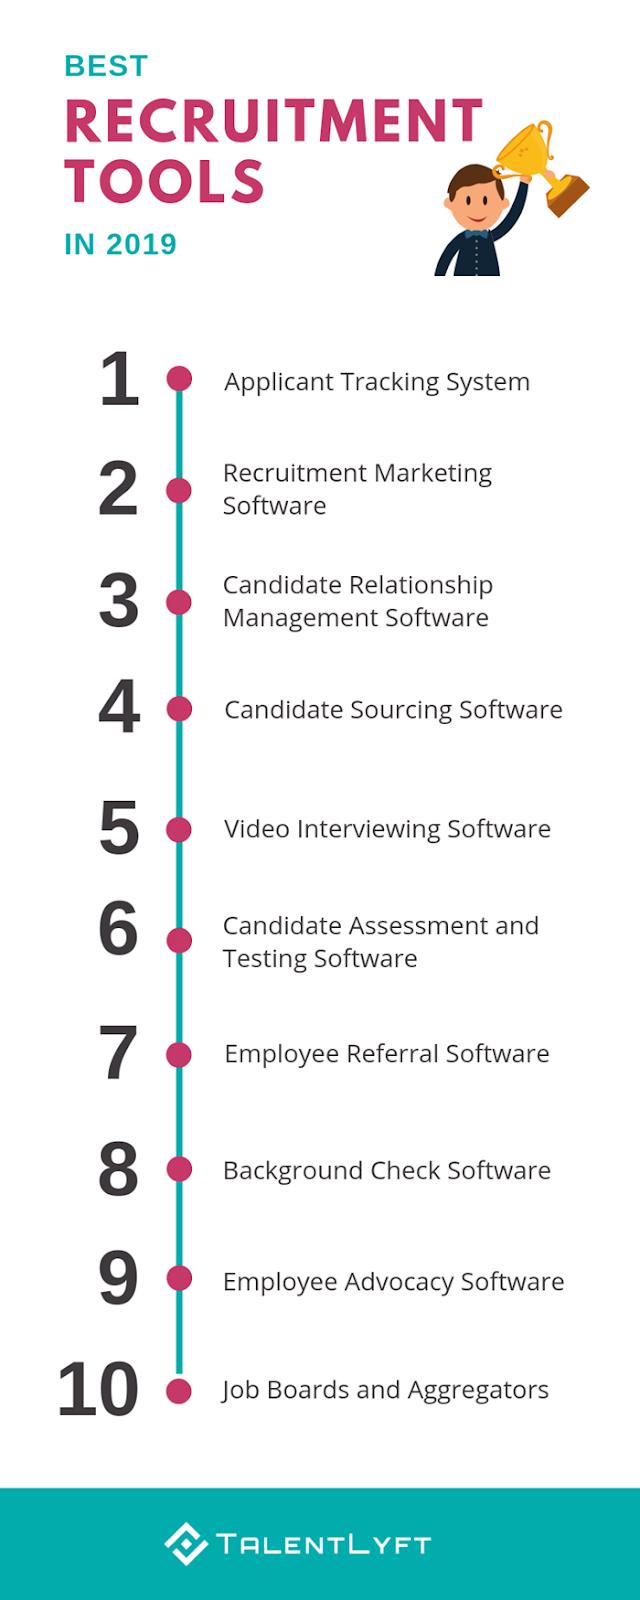 10 Best Recruitment Tools In 2020 Infographic Hr Jobs Recruitment Job Ads